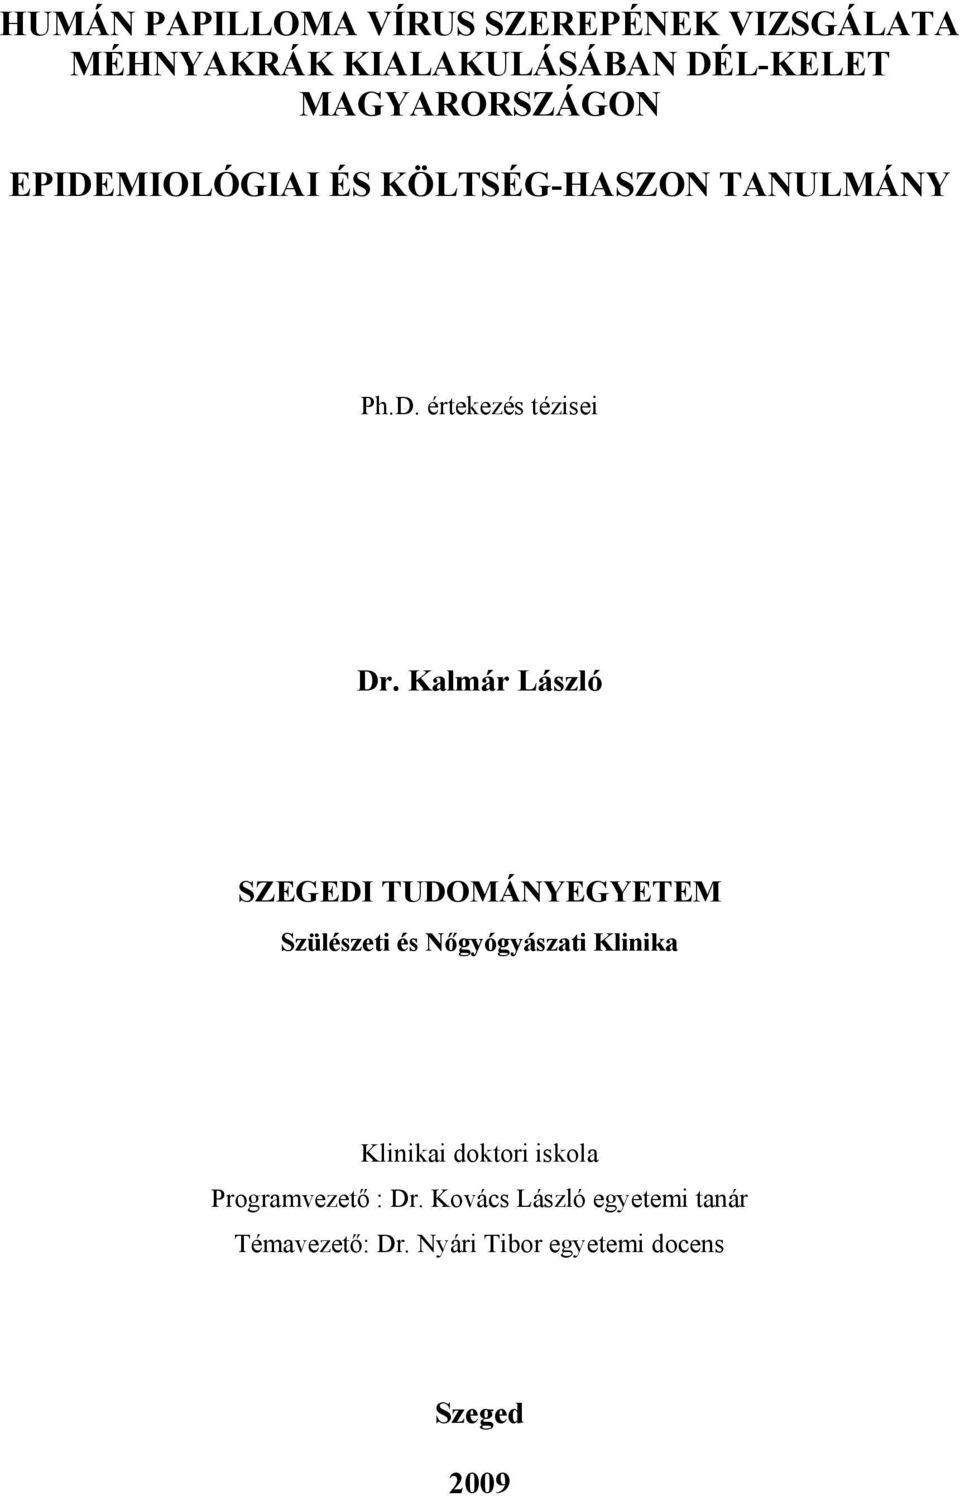 papilloma vírus vizsgálati ember)